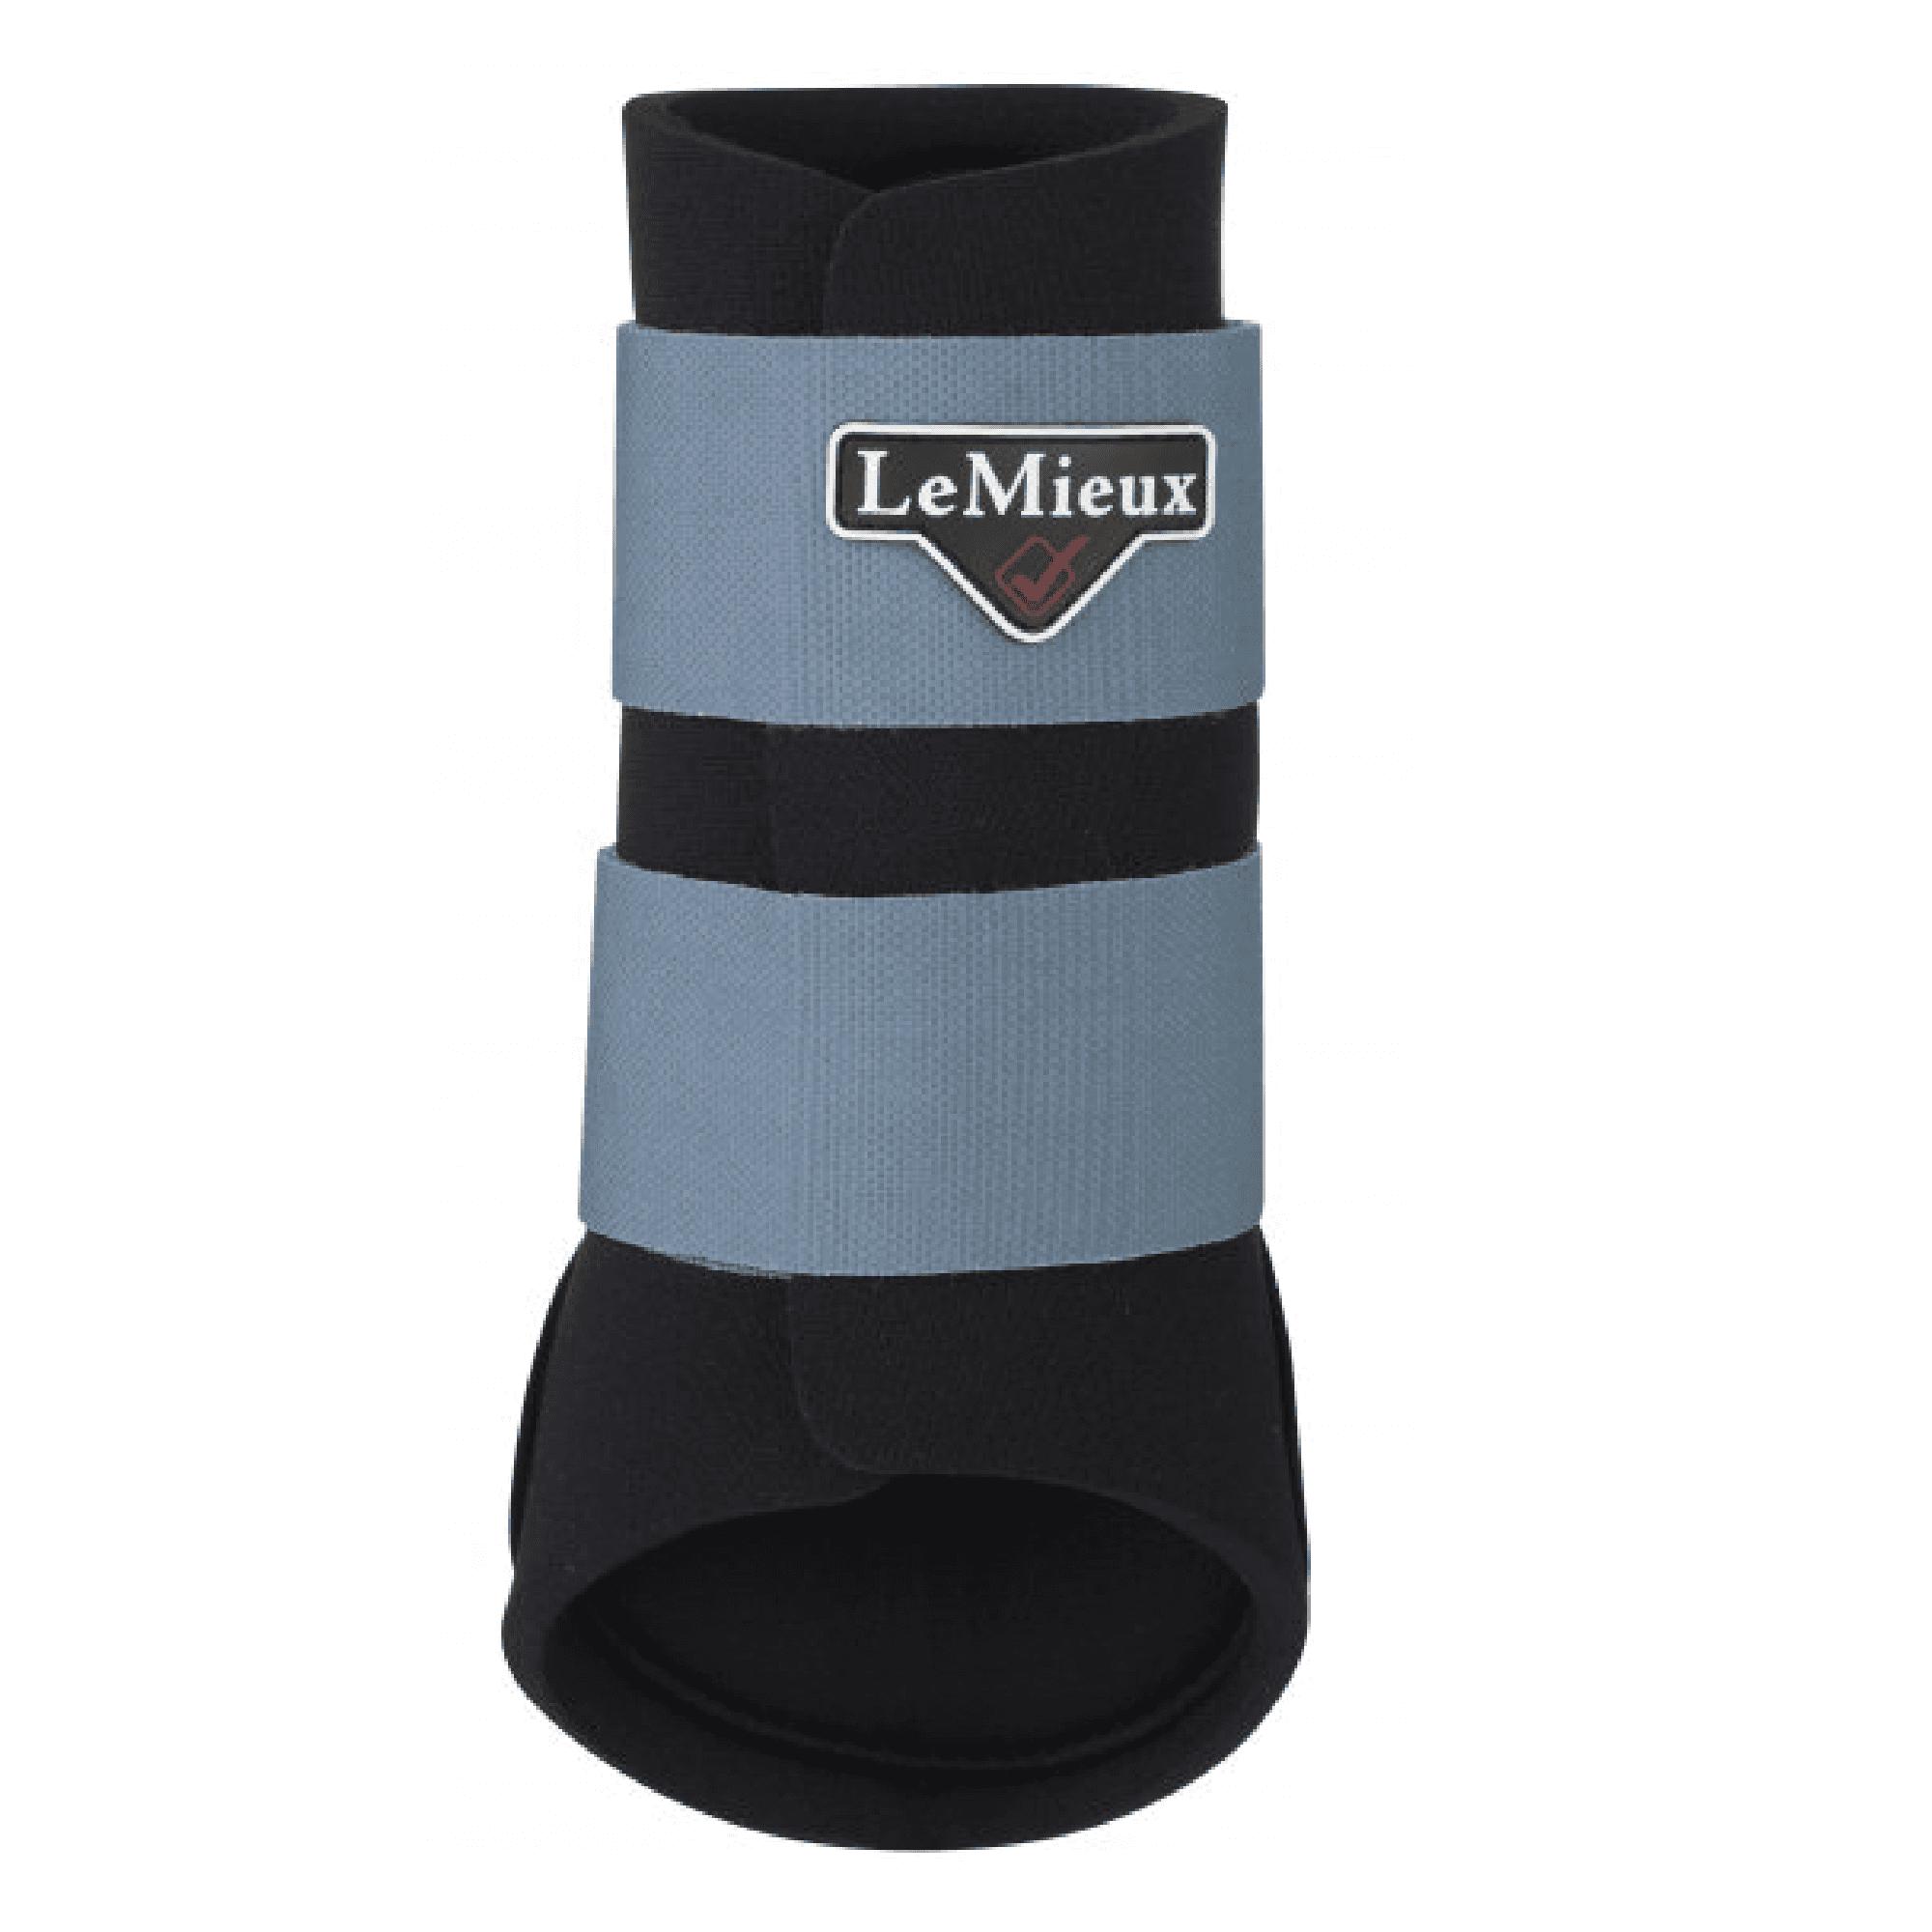 LeMieux-ProSport-Grafter-Brushing-Boots-Dressage-Schooling-Turnout-Boots thumbnail 24